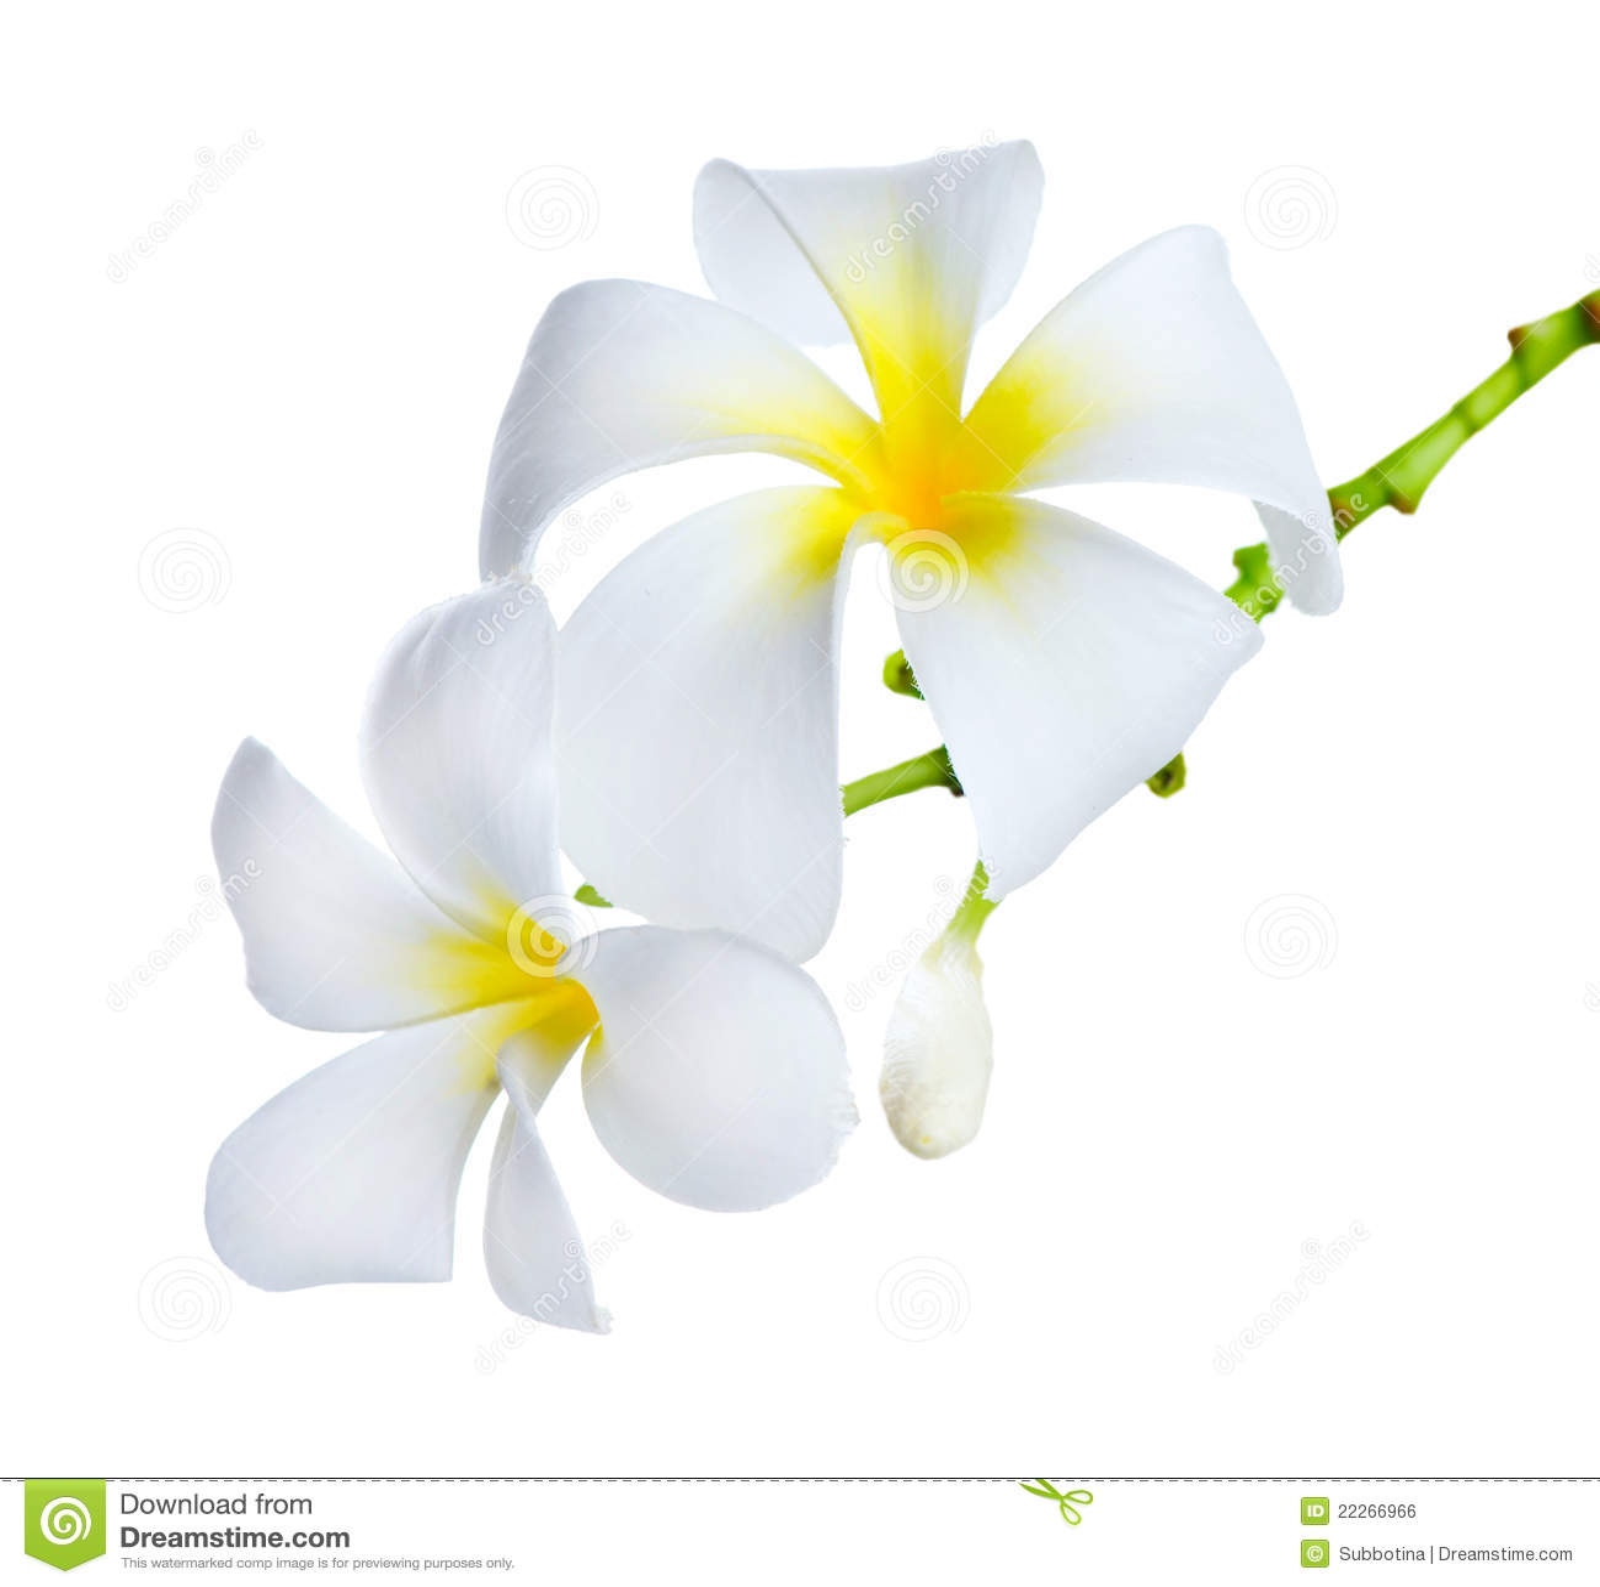 Frangipani spa flowers stock photo image 14654190 - Frangipani Spa Flowers Royalty Free Stock Image